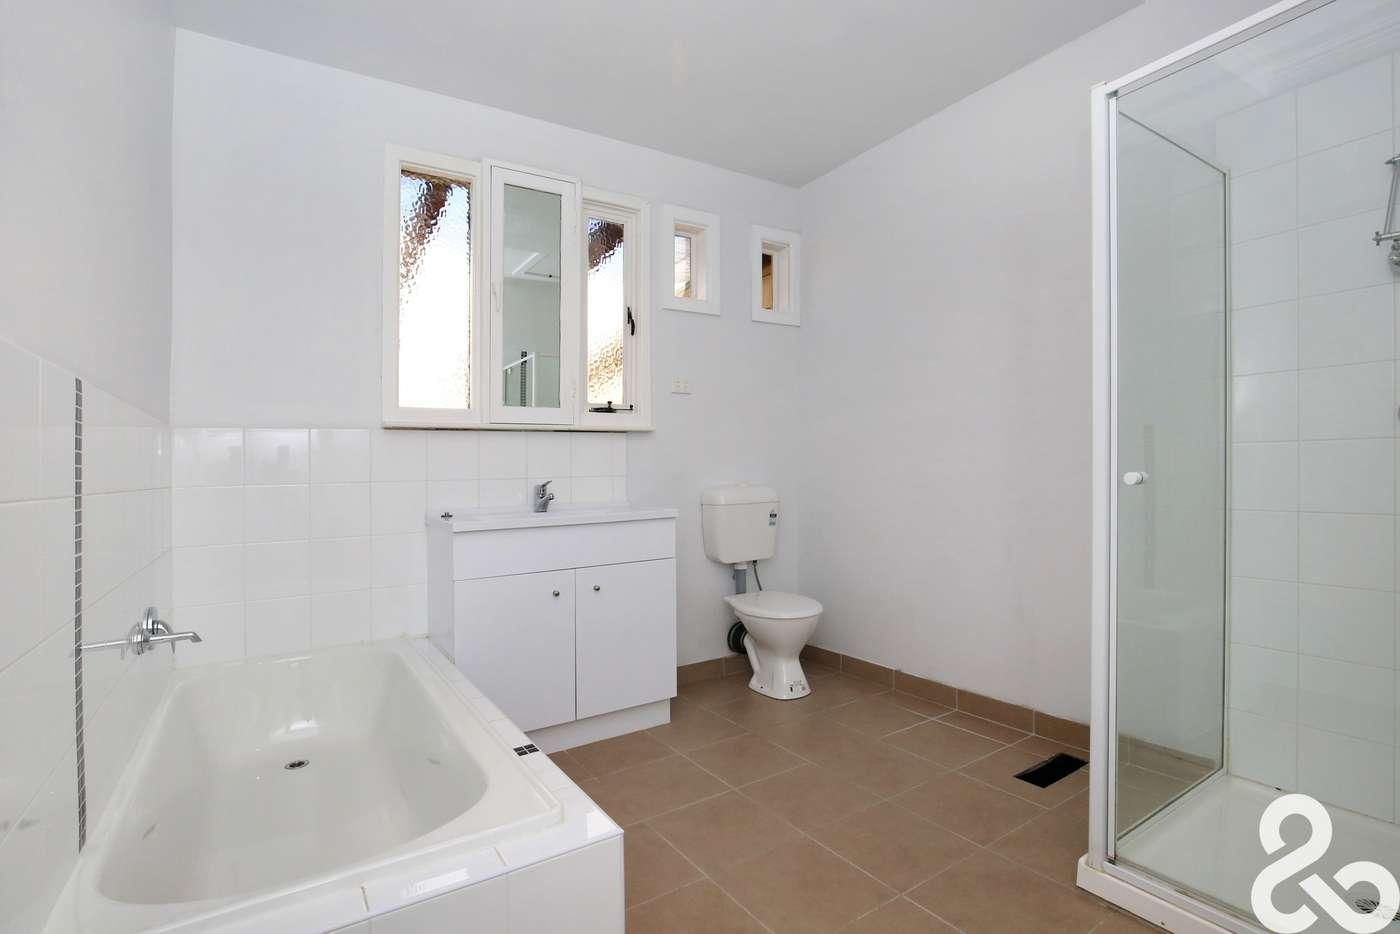 Sixth view of Homely house listing, 33 Gordon Grove, Preston VIC 3072